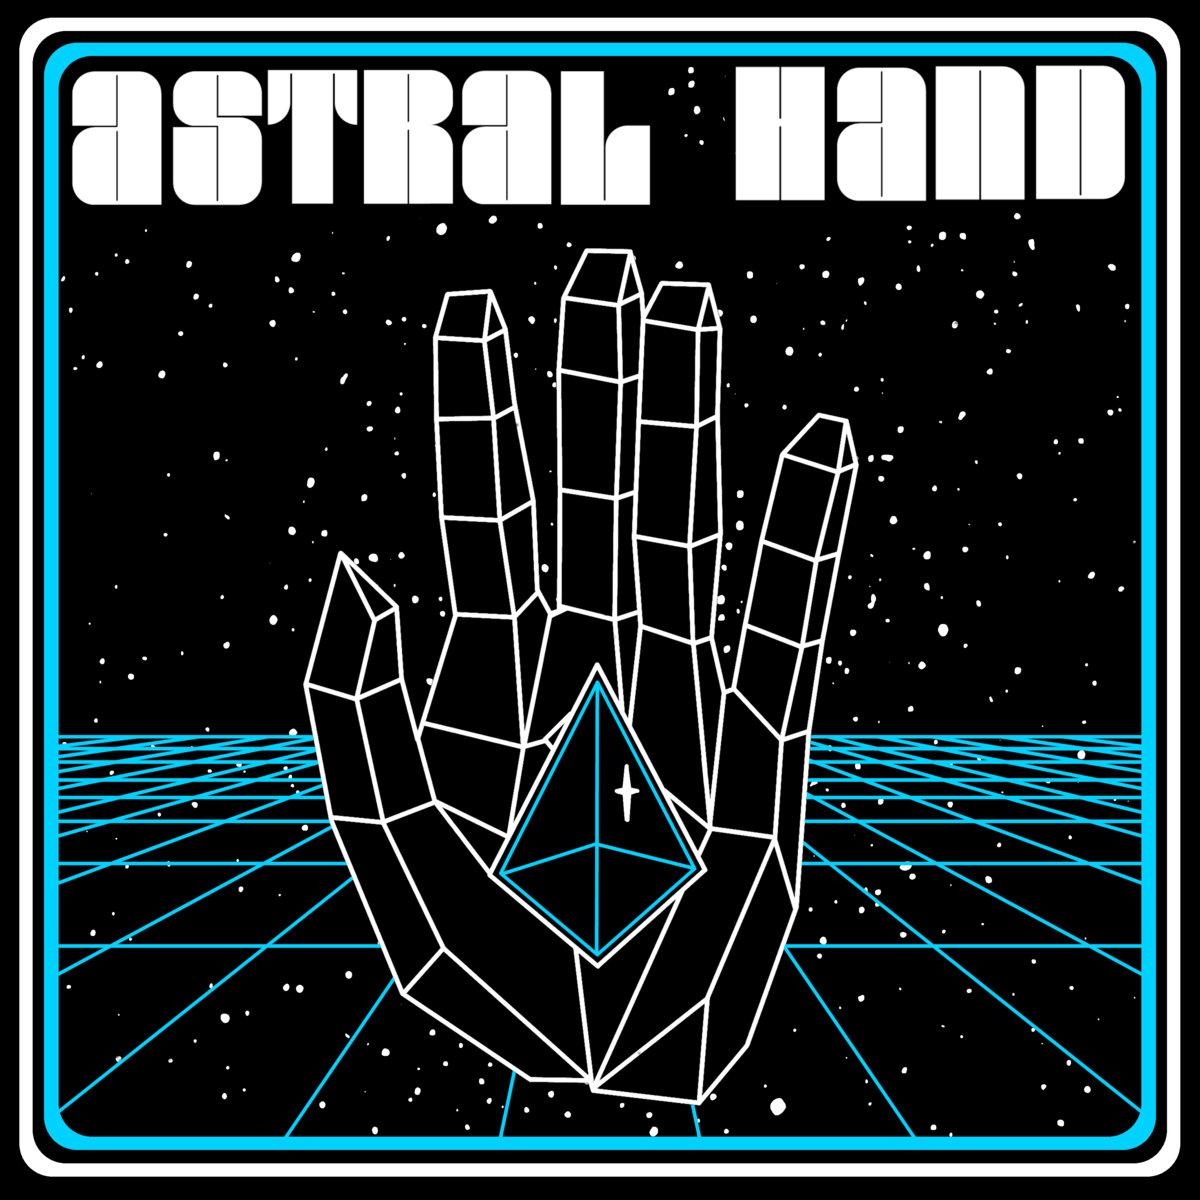 astral hand universe machine